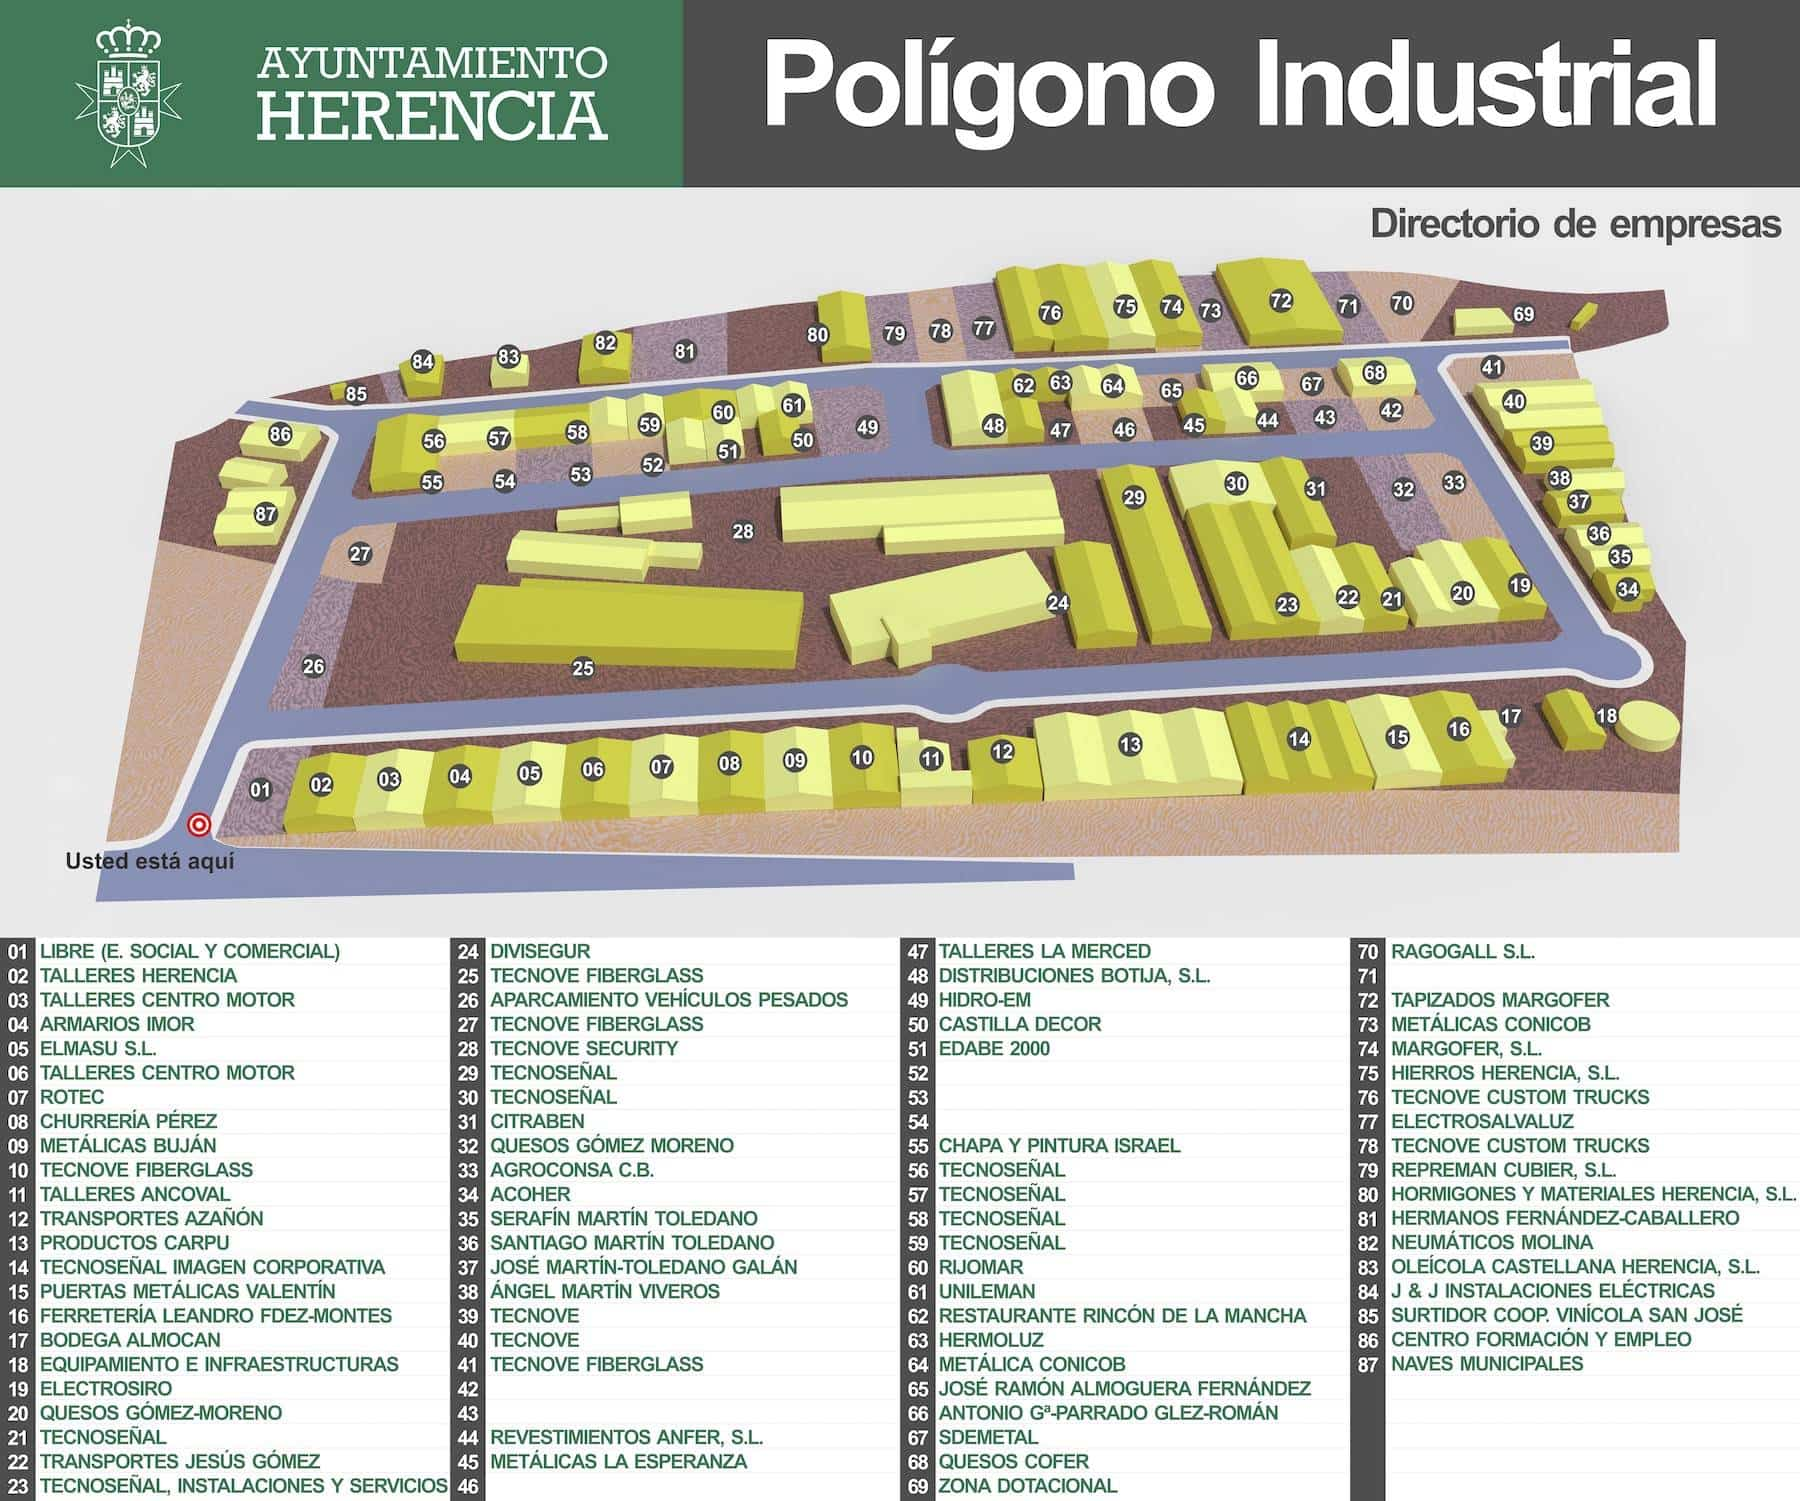 directorio empresas poligono herencia - Plan de dinamización empresarial en Herencia